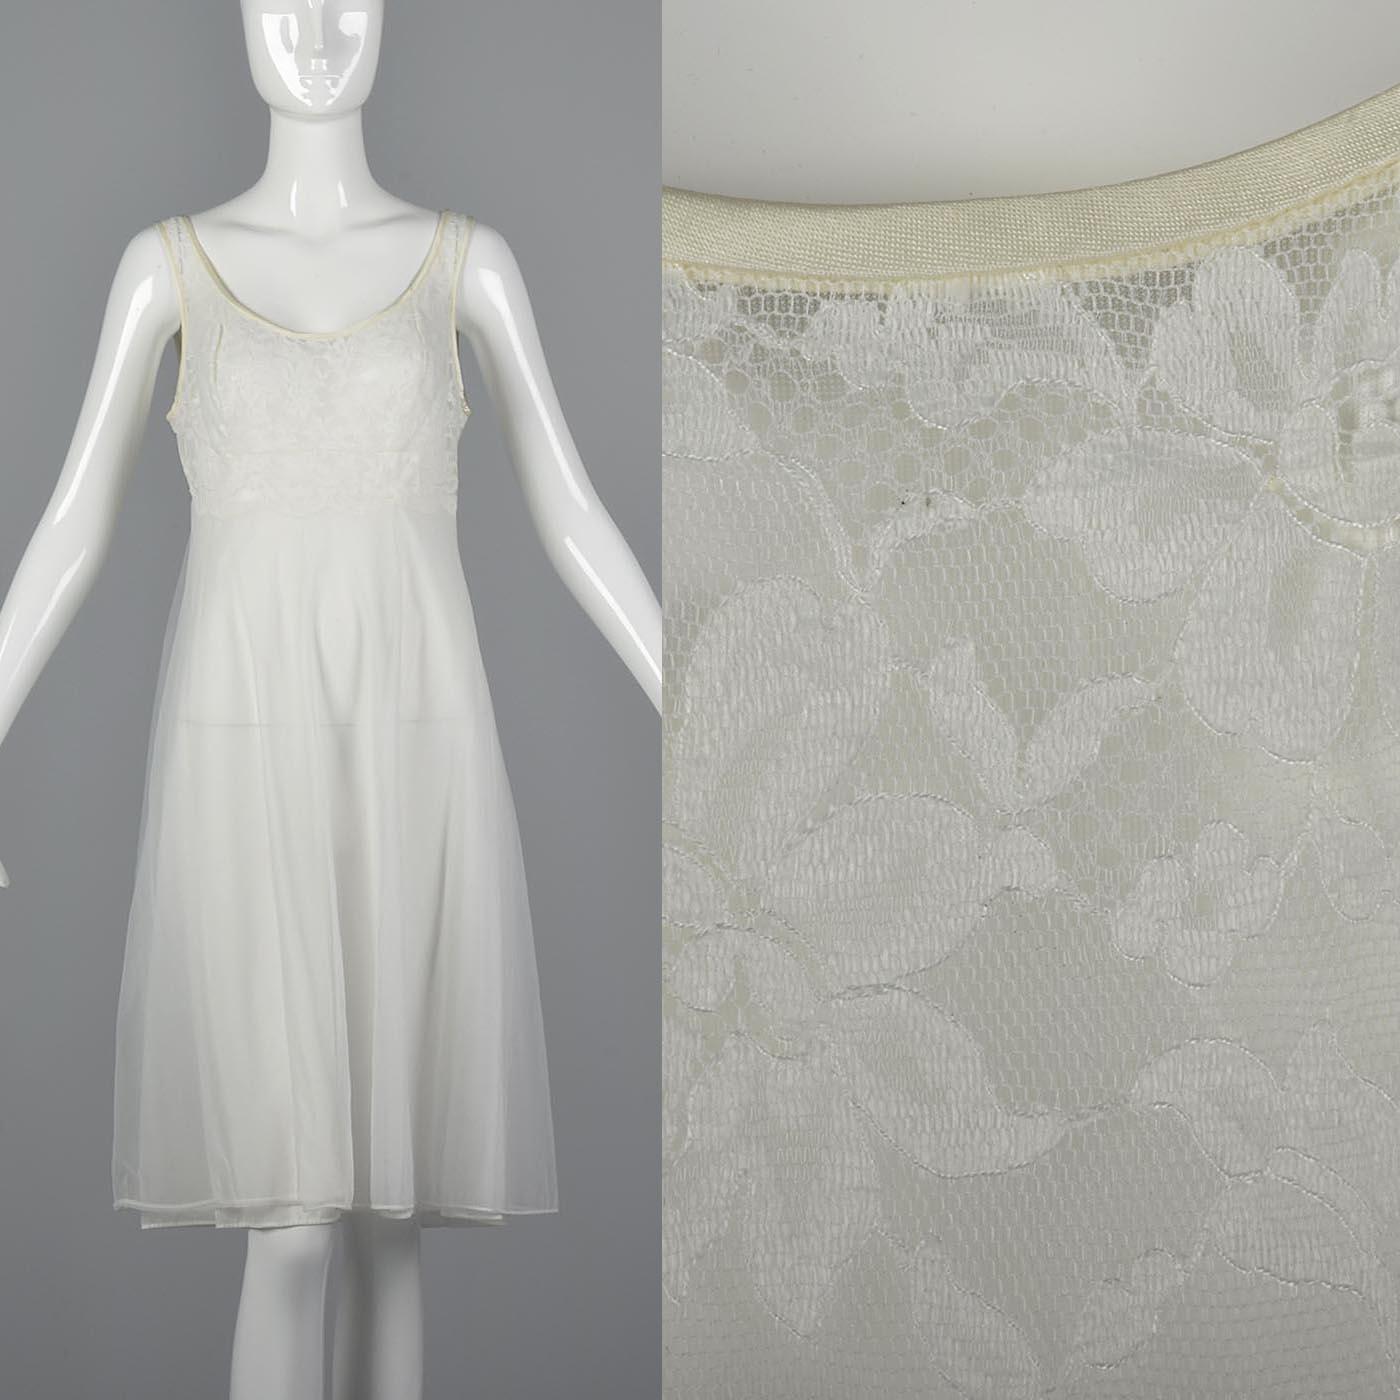 L Vintage 1950s 50s Sheer Sleepwear Honeymoon Nightgown Ivory Lace Wedding  Gown a9ea42928